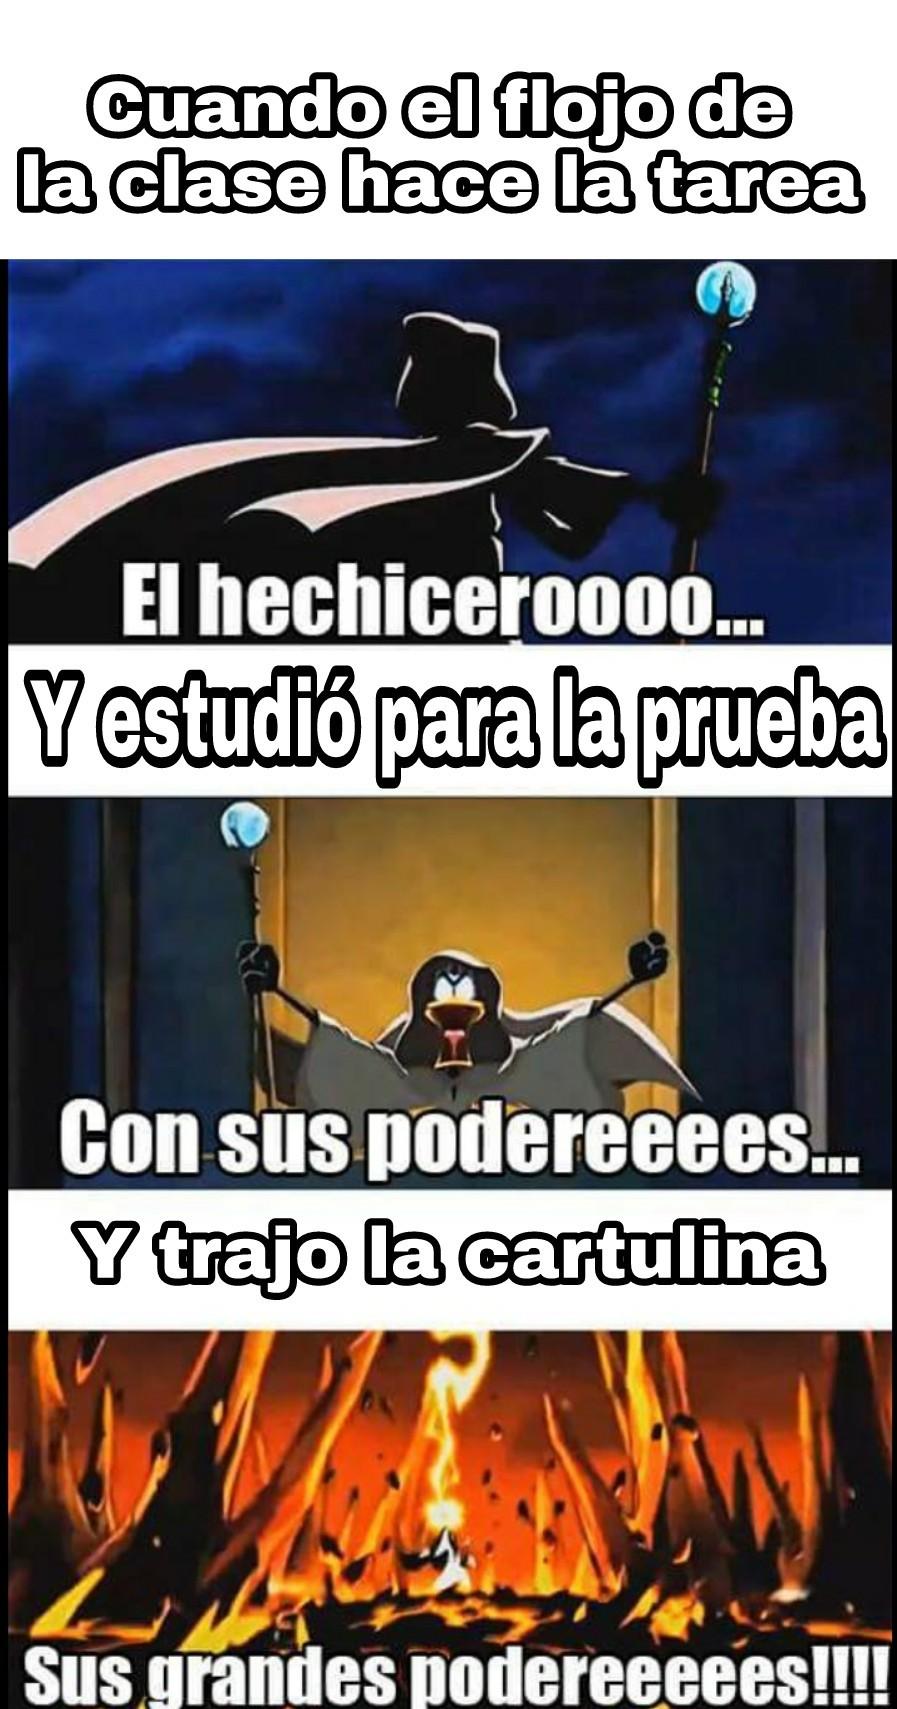 El hechicero... - meme